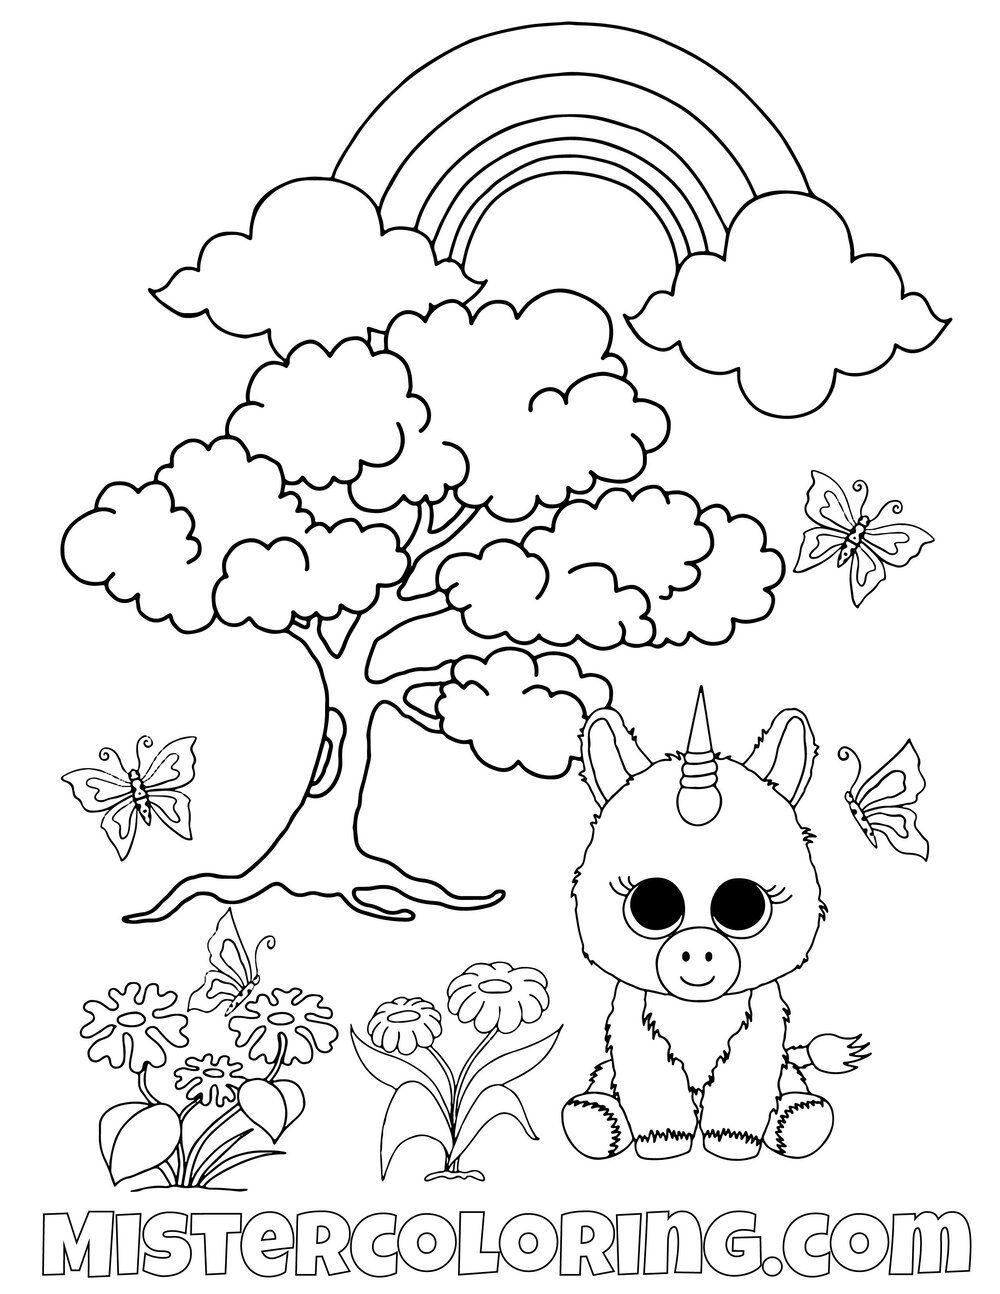 Rainbow World Beanie Boo Coloring Pages For Kids Kleurplaten Voor Kinderen Kleurplaten Beanie Boo